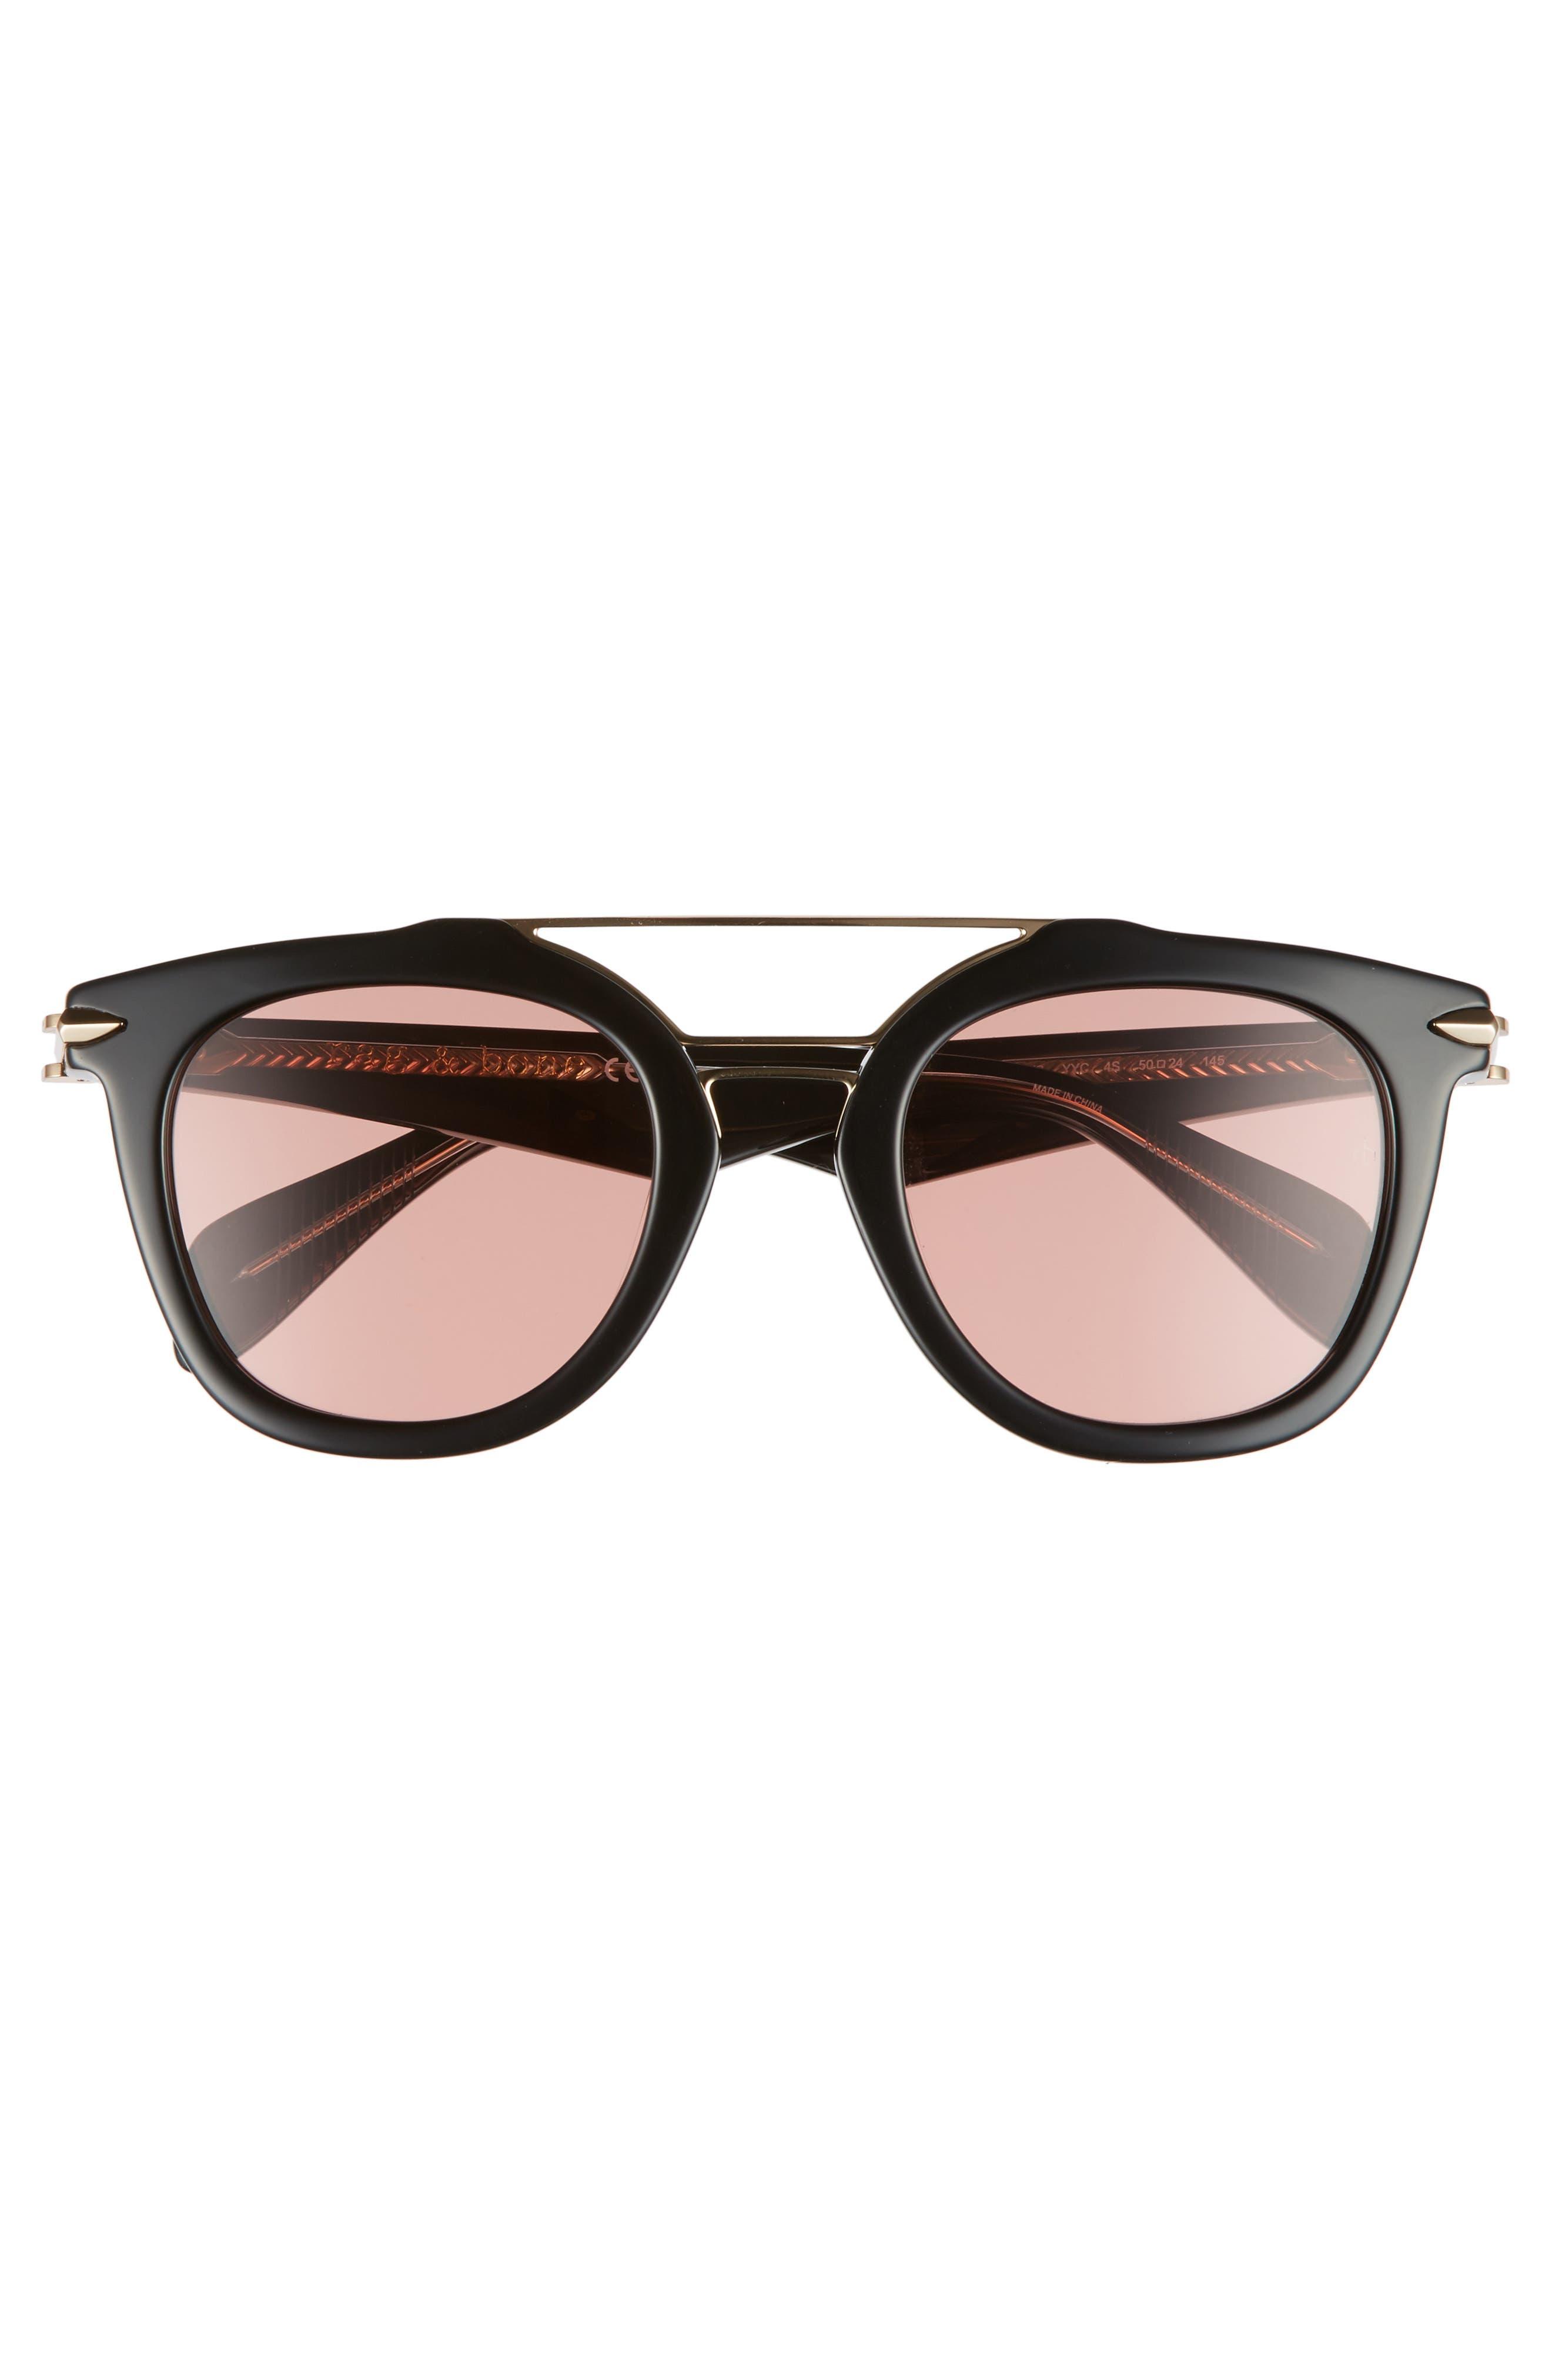 50mm Round Aviator Sunglasses,                             Alternate thumbnail 3, color,                             BLACK/ GOLD/ BRONZE